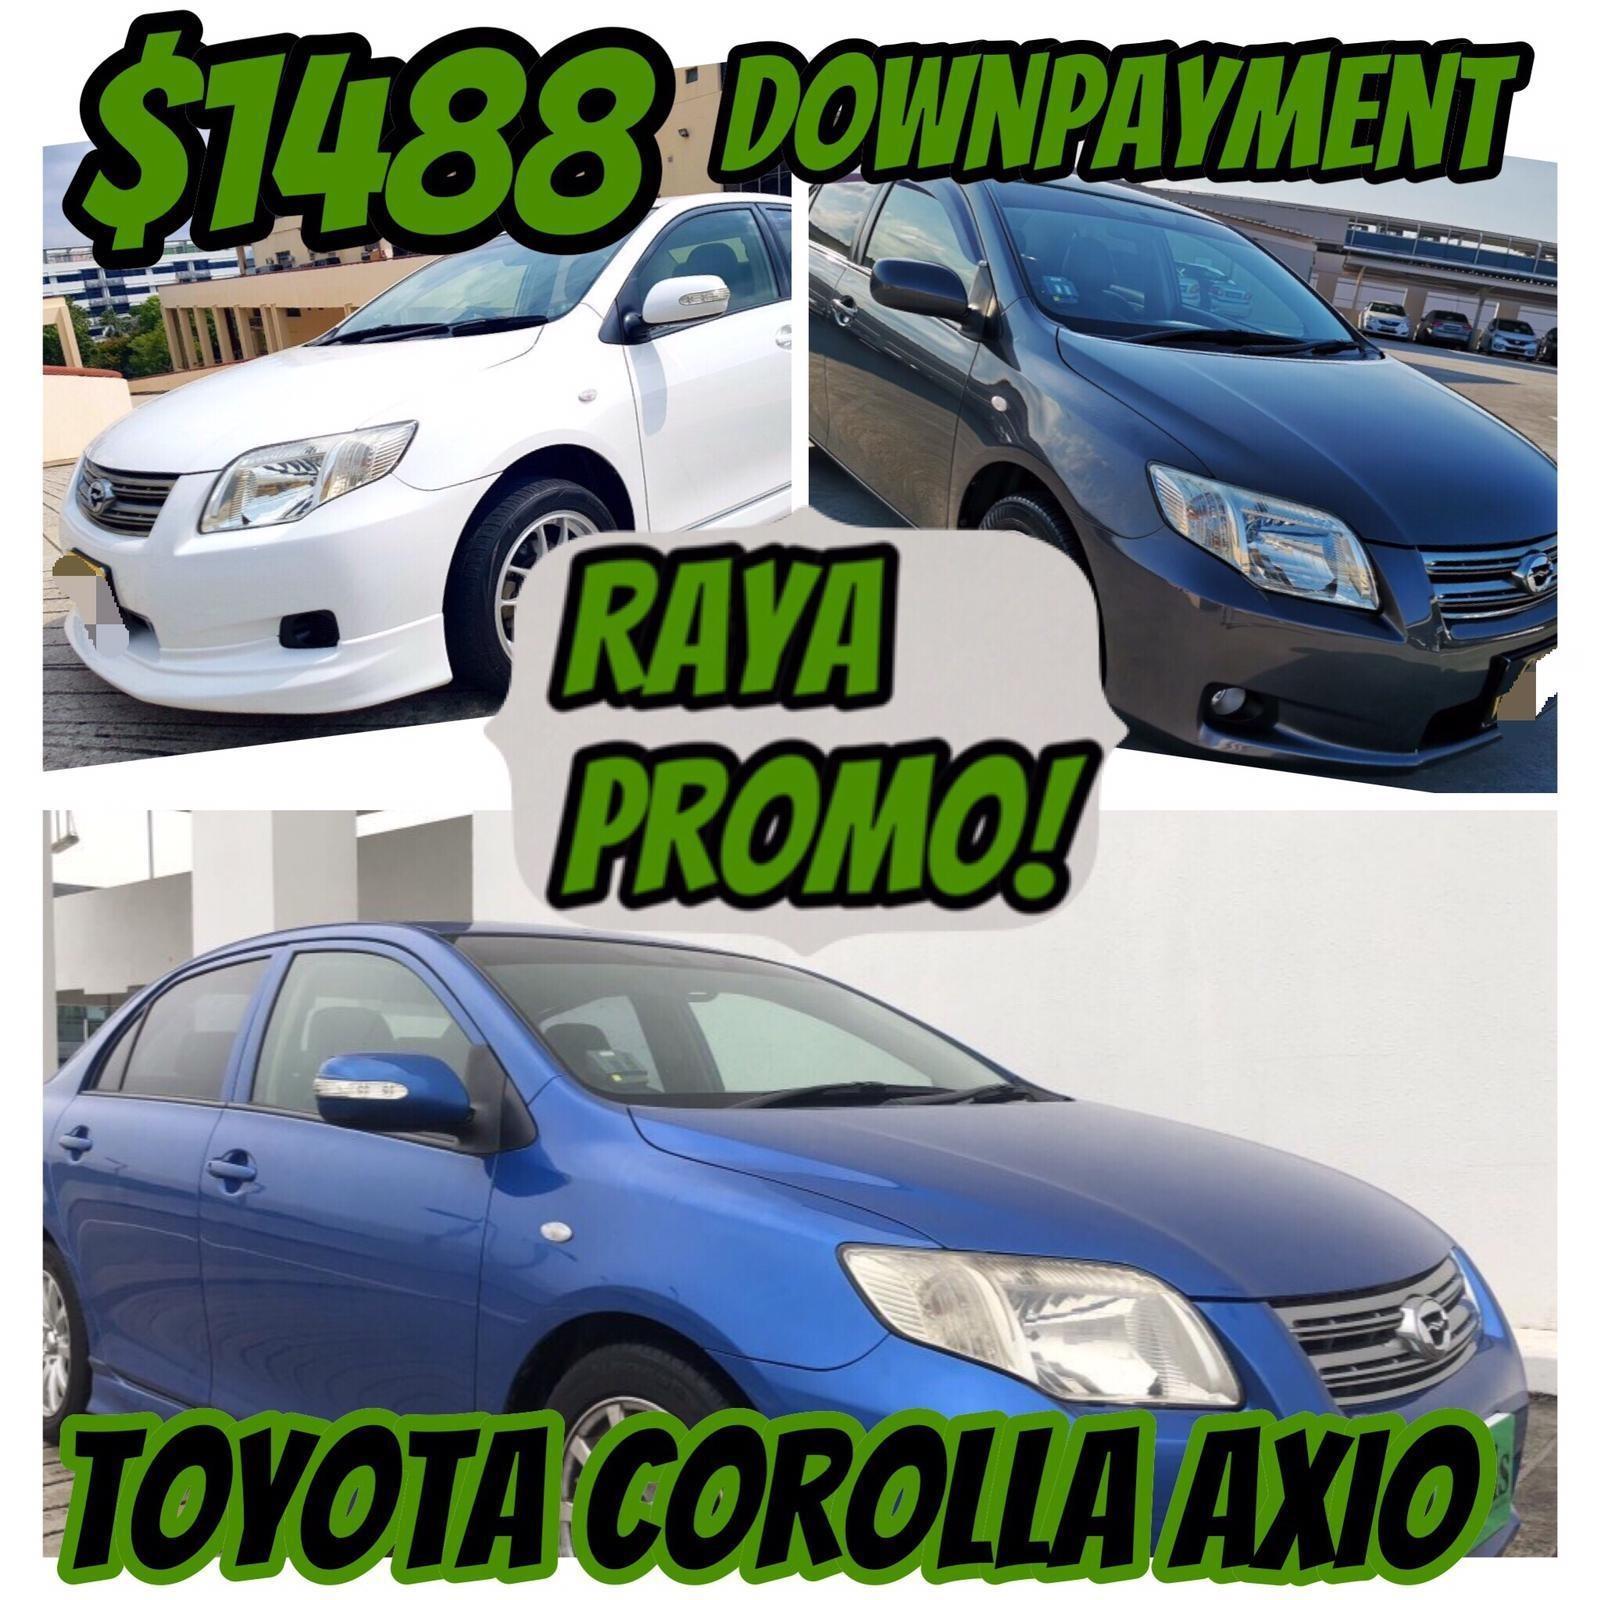 Toyota TOYOTA COROLLA AXIO